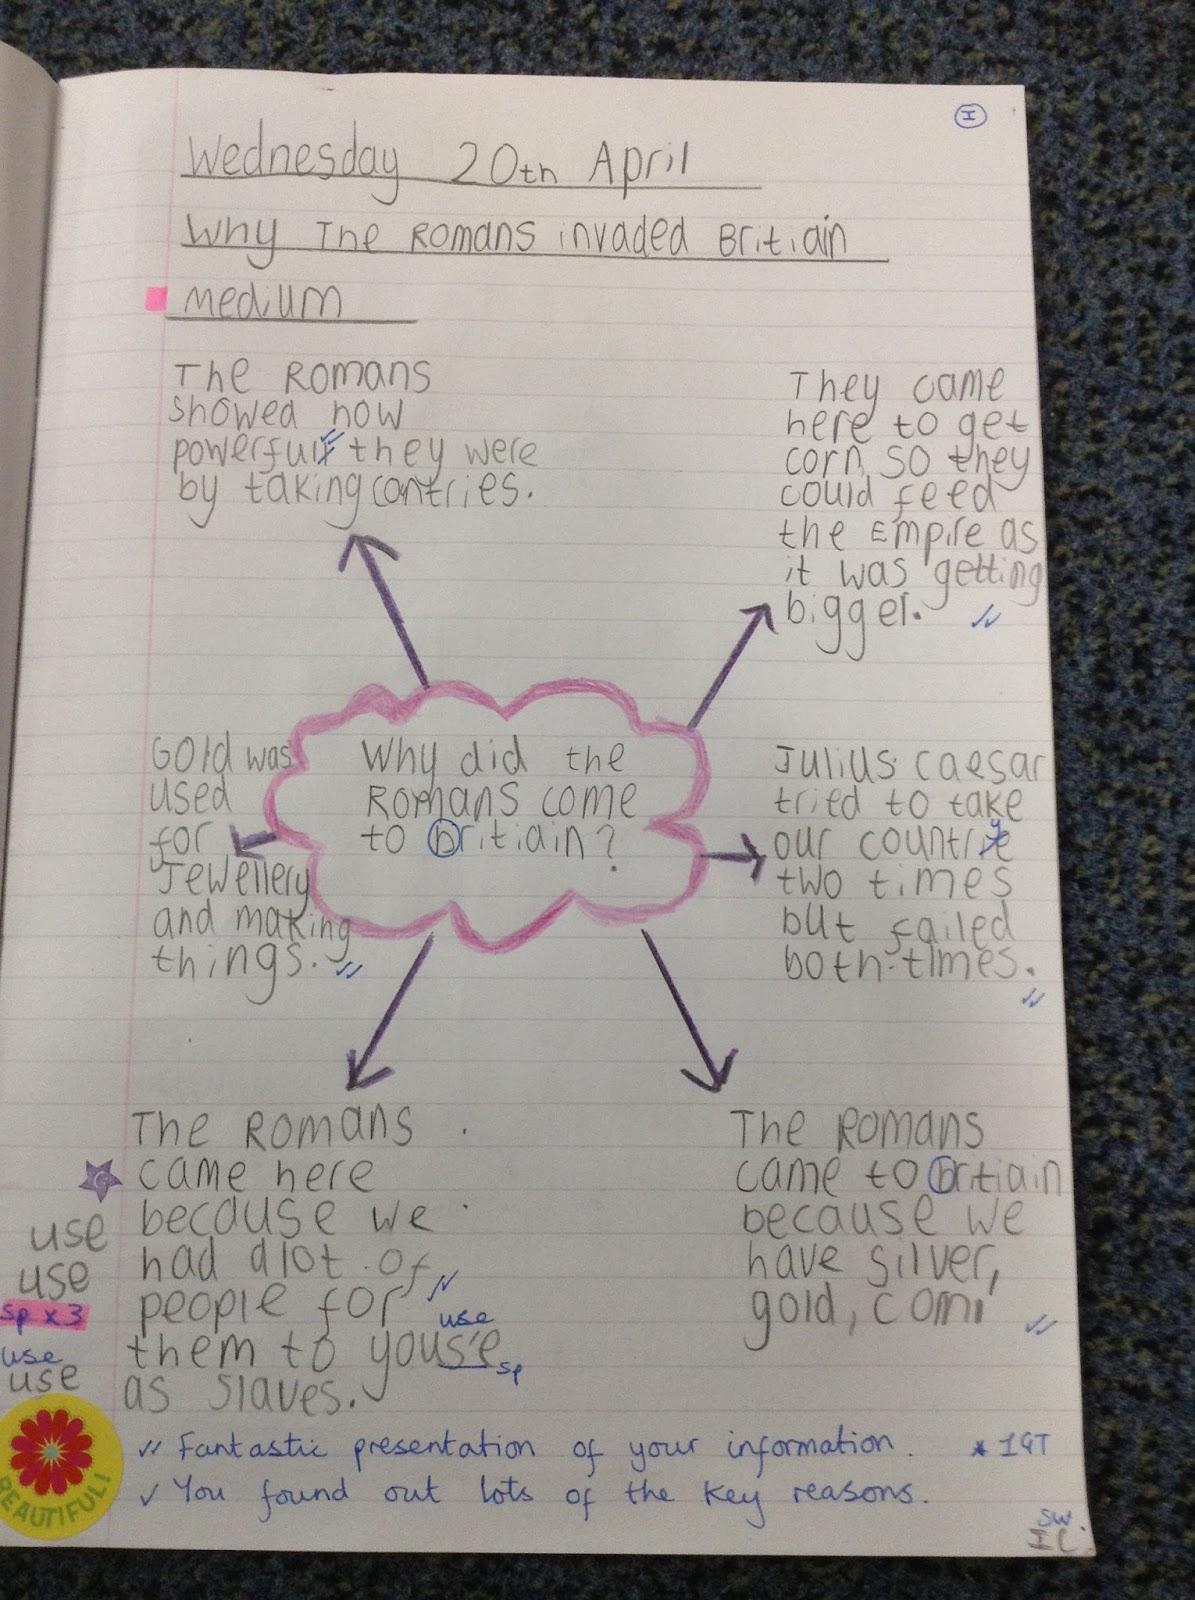 Homework help about romans